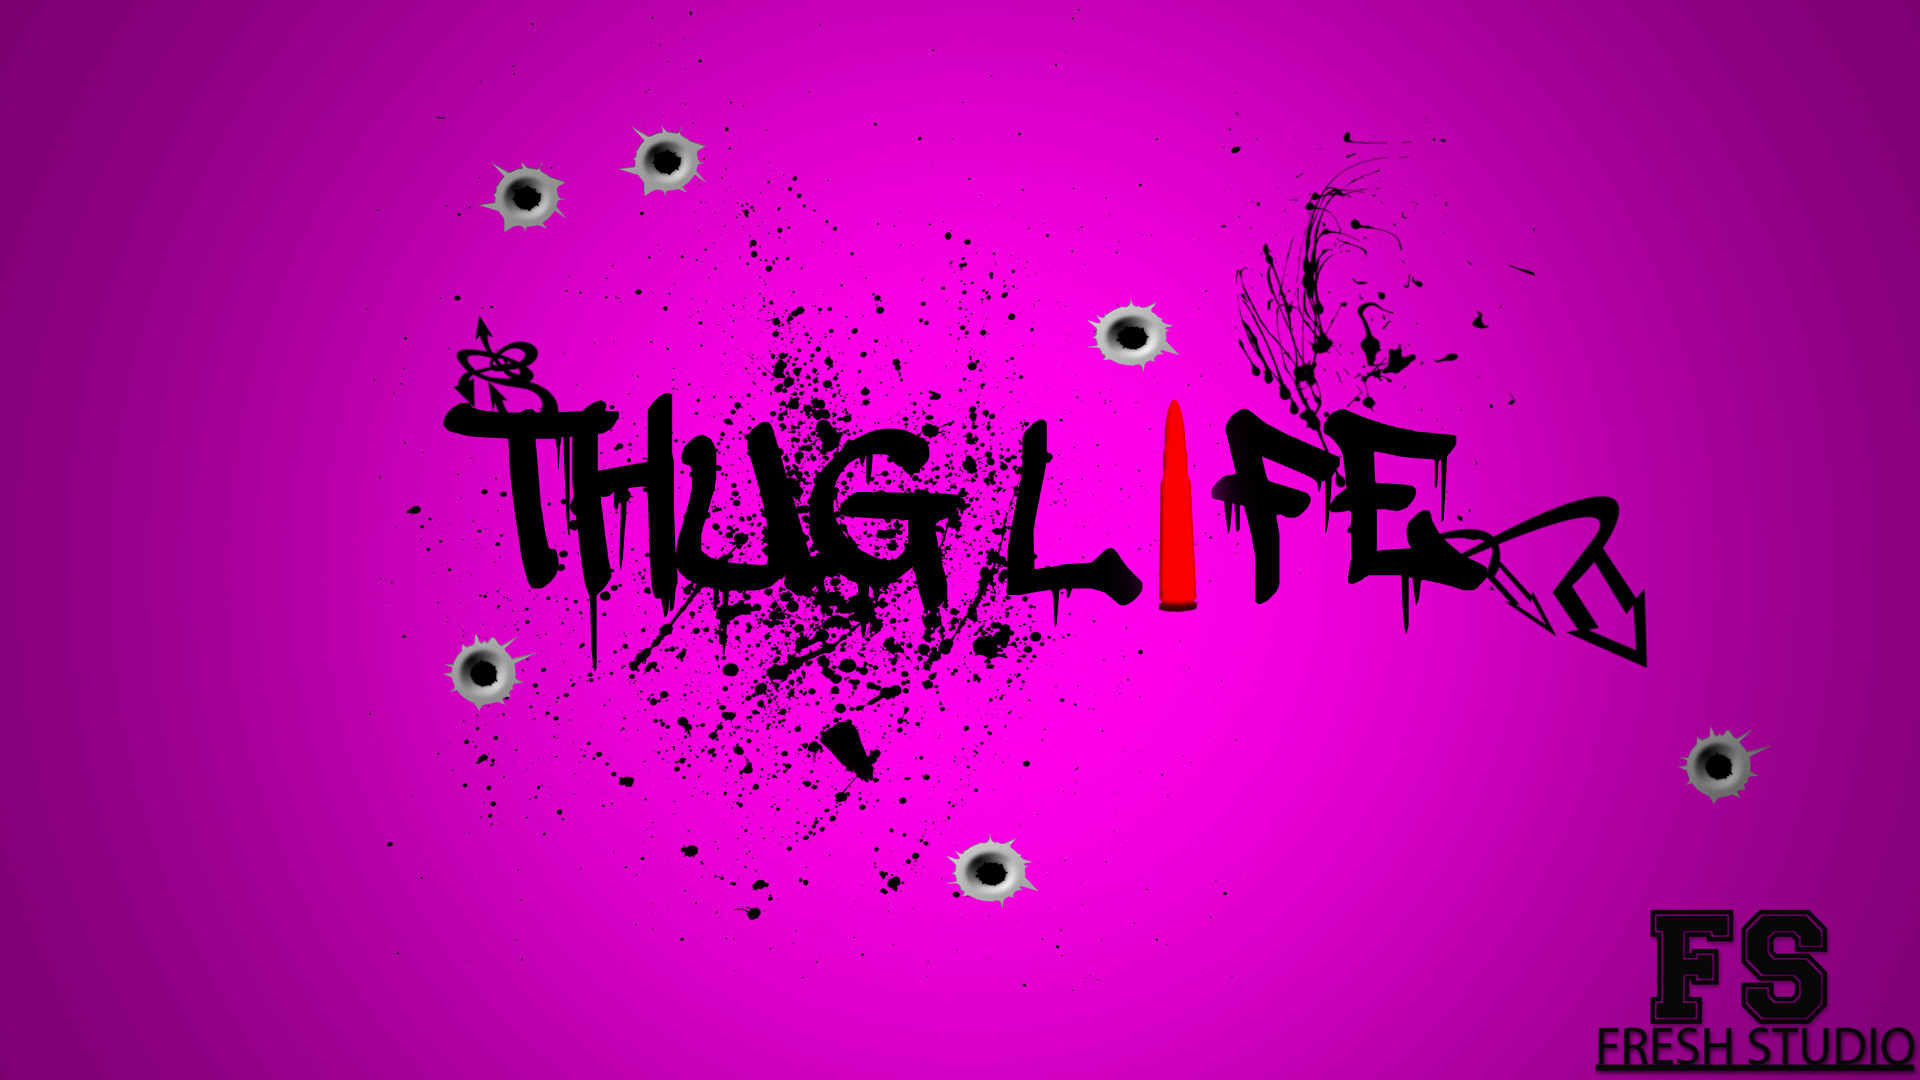 ThugLife Graffiti wallpaper HD by freshofficial ThugLife Graffiti wallpaper  HD by freshofficial